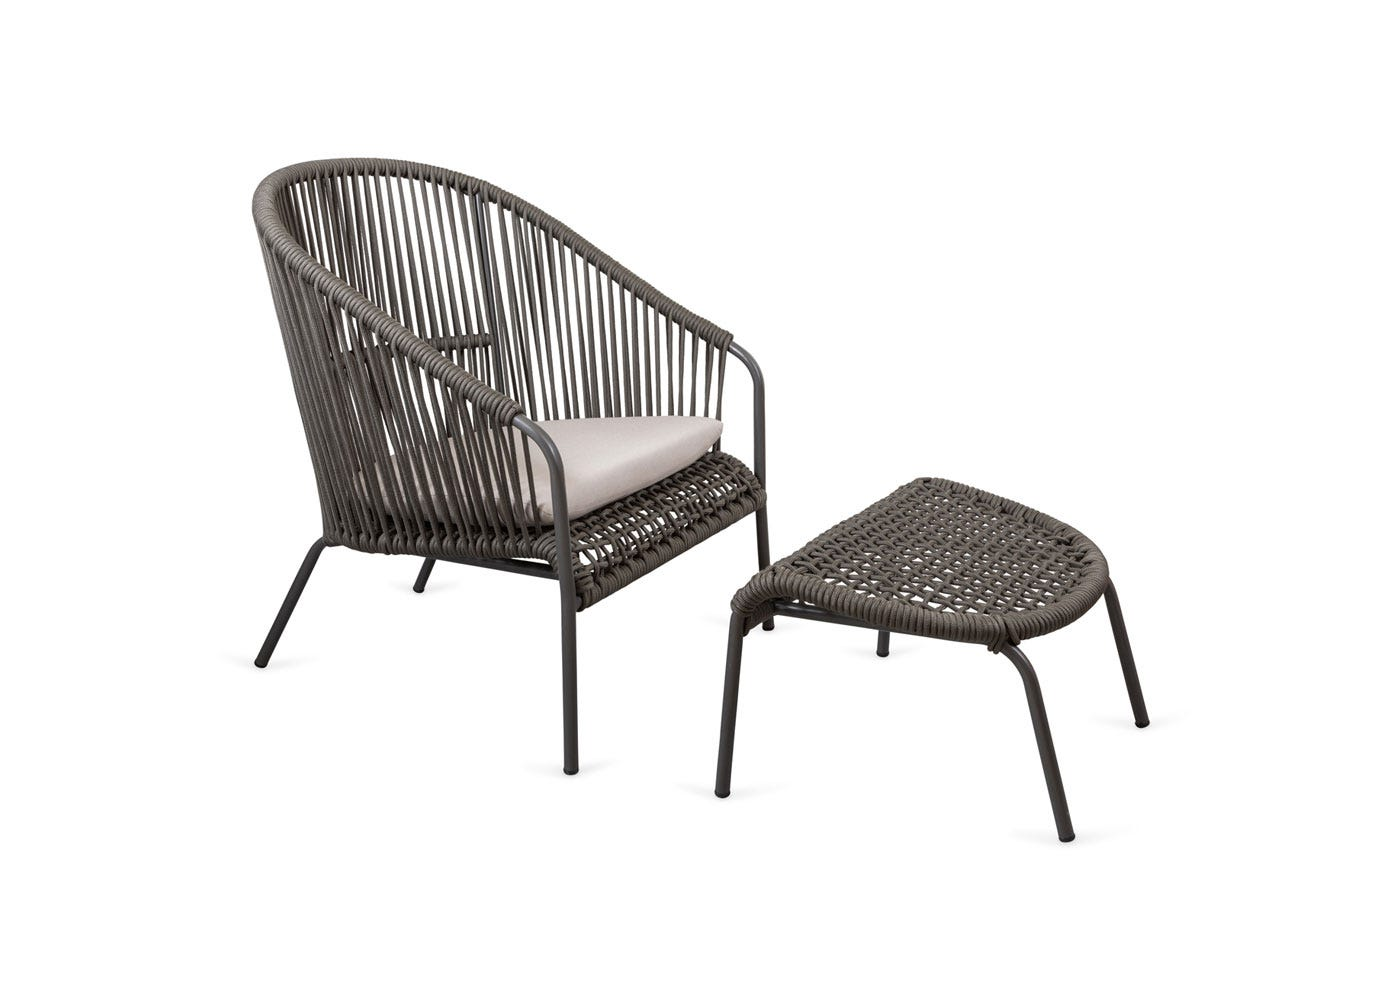 As shown: Filo outdoor chair & ottoman - Side profile.